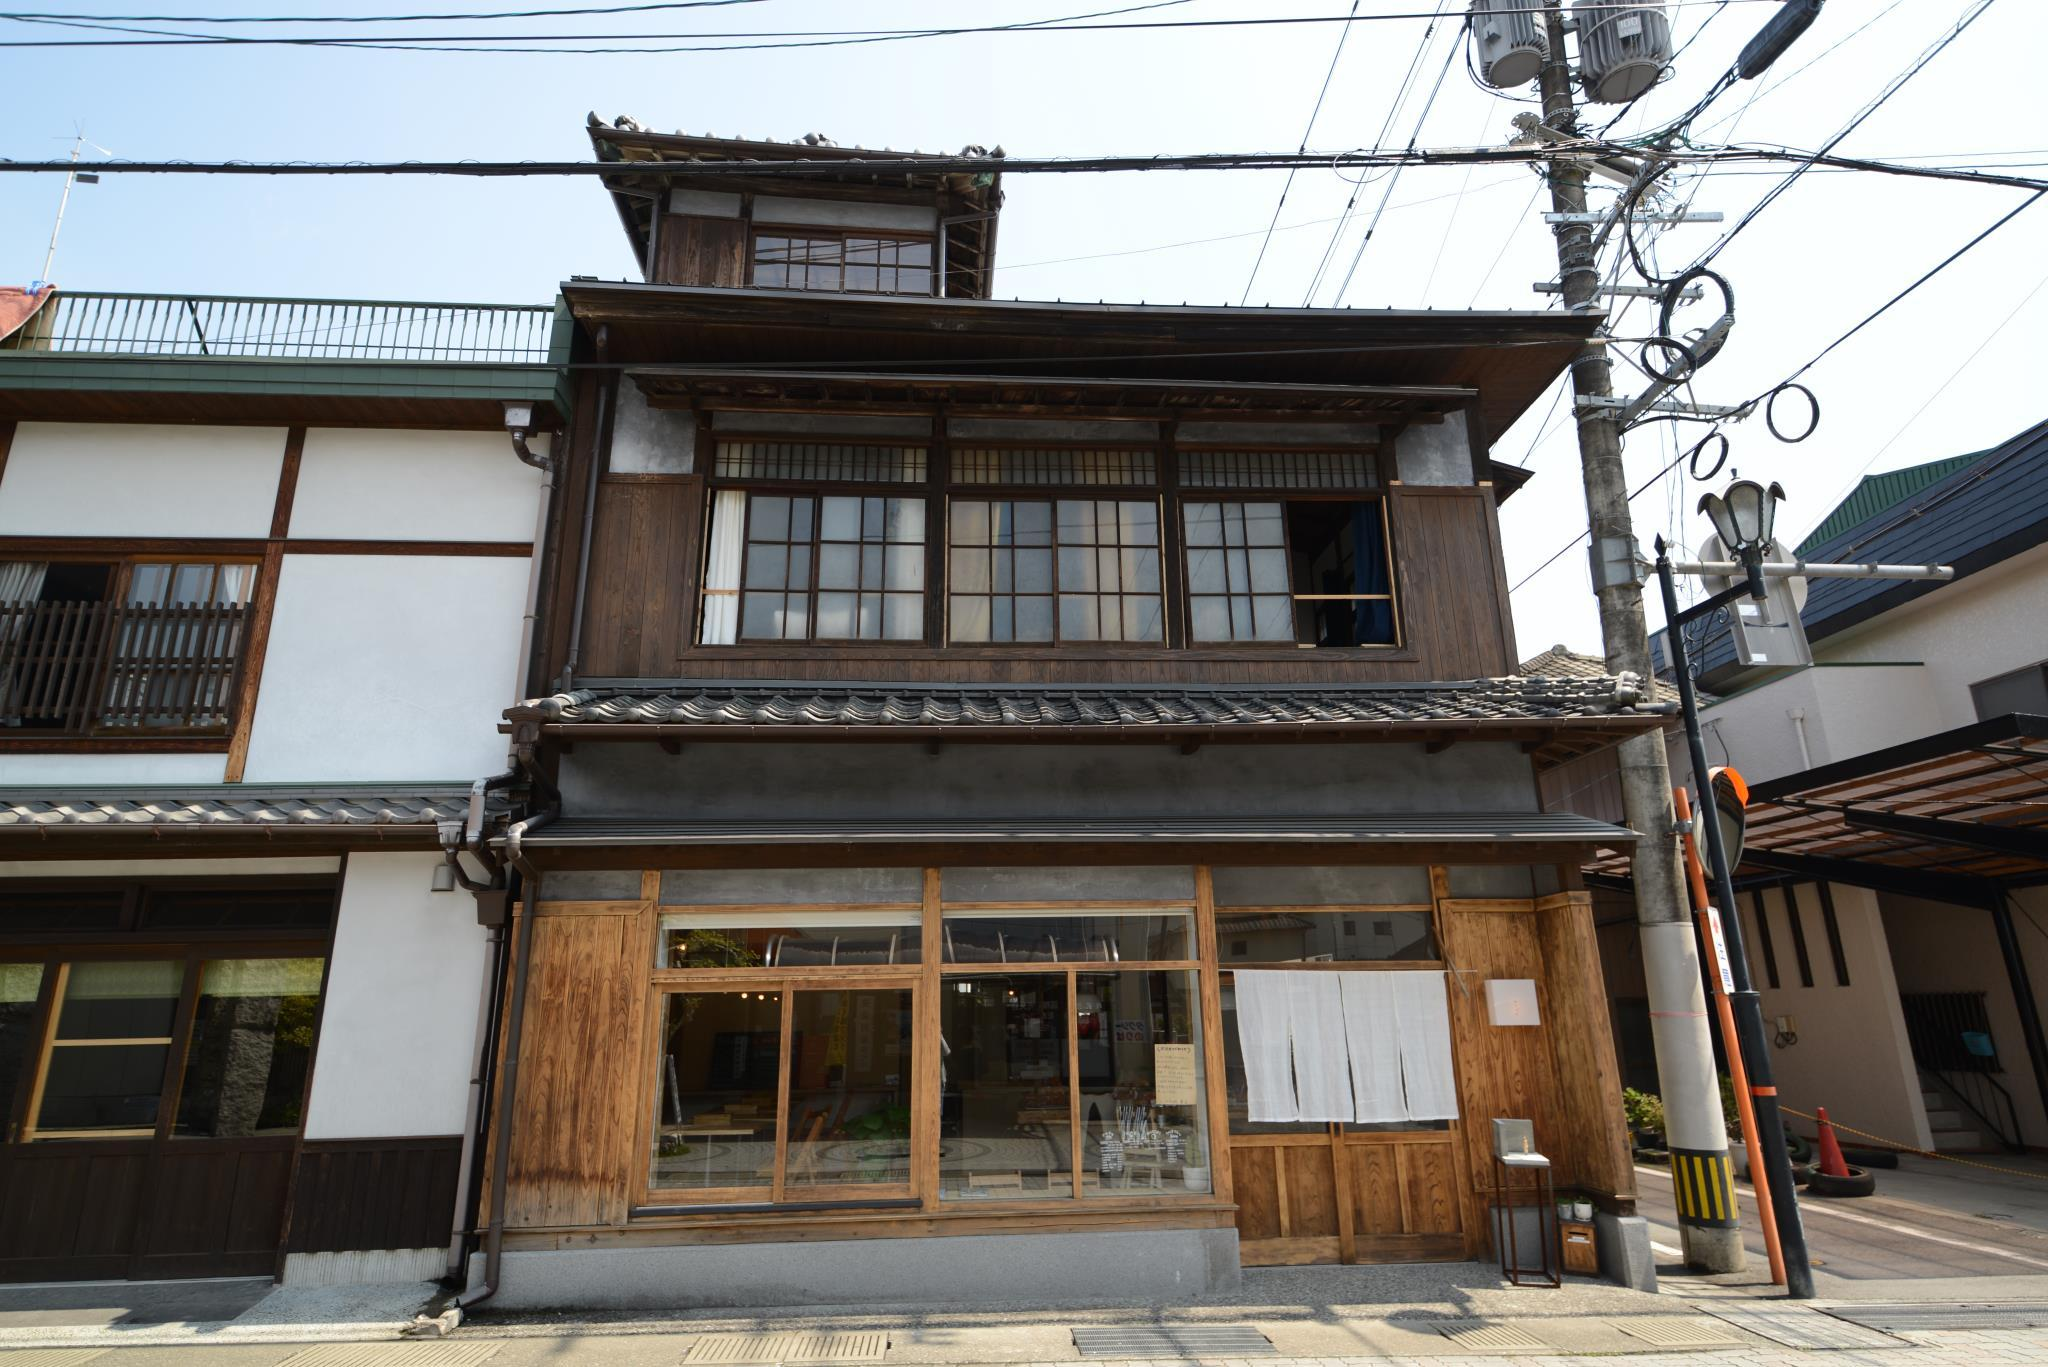 TAKETA Station Hostel Cue